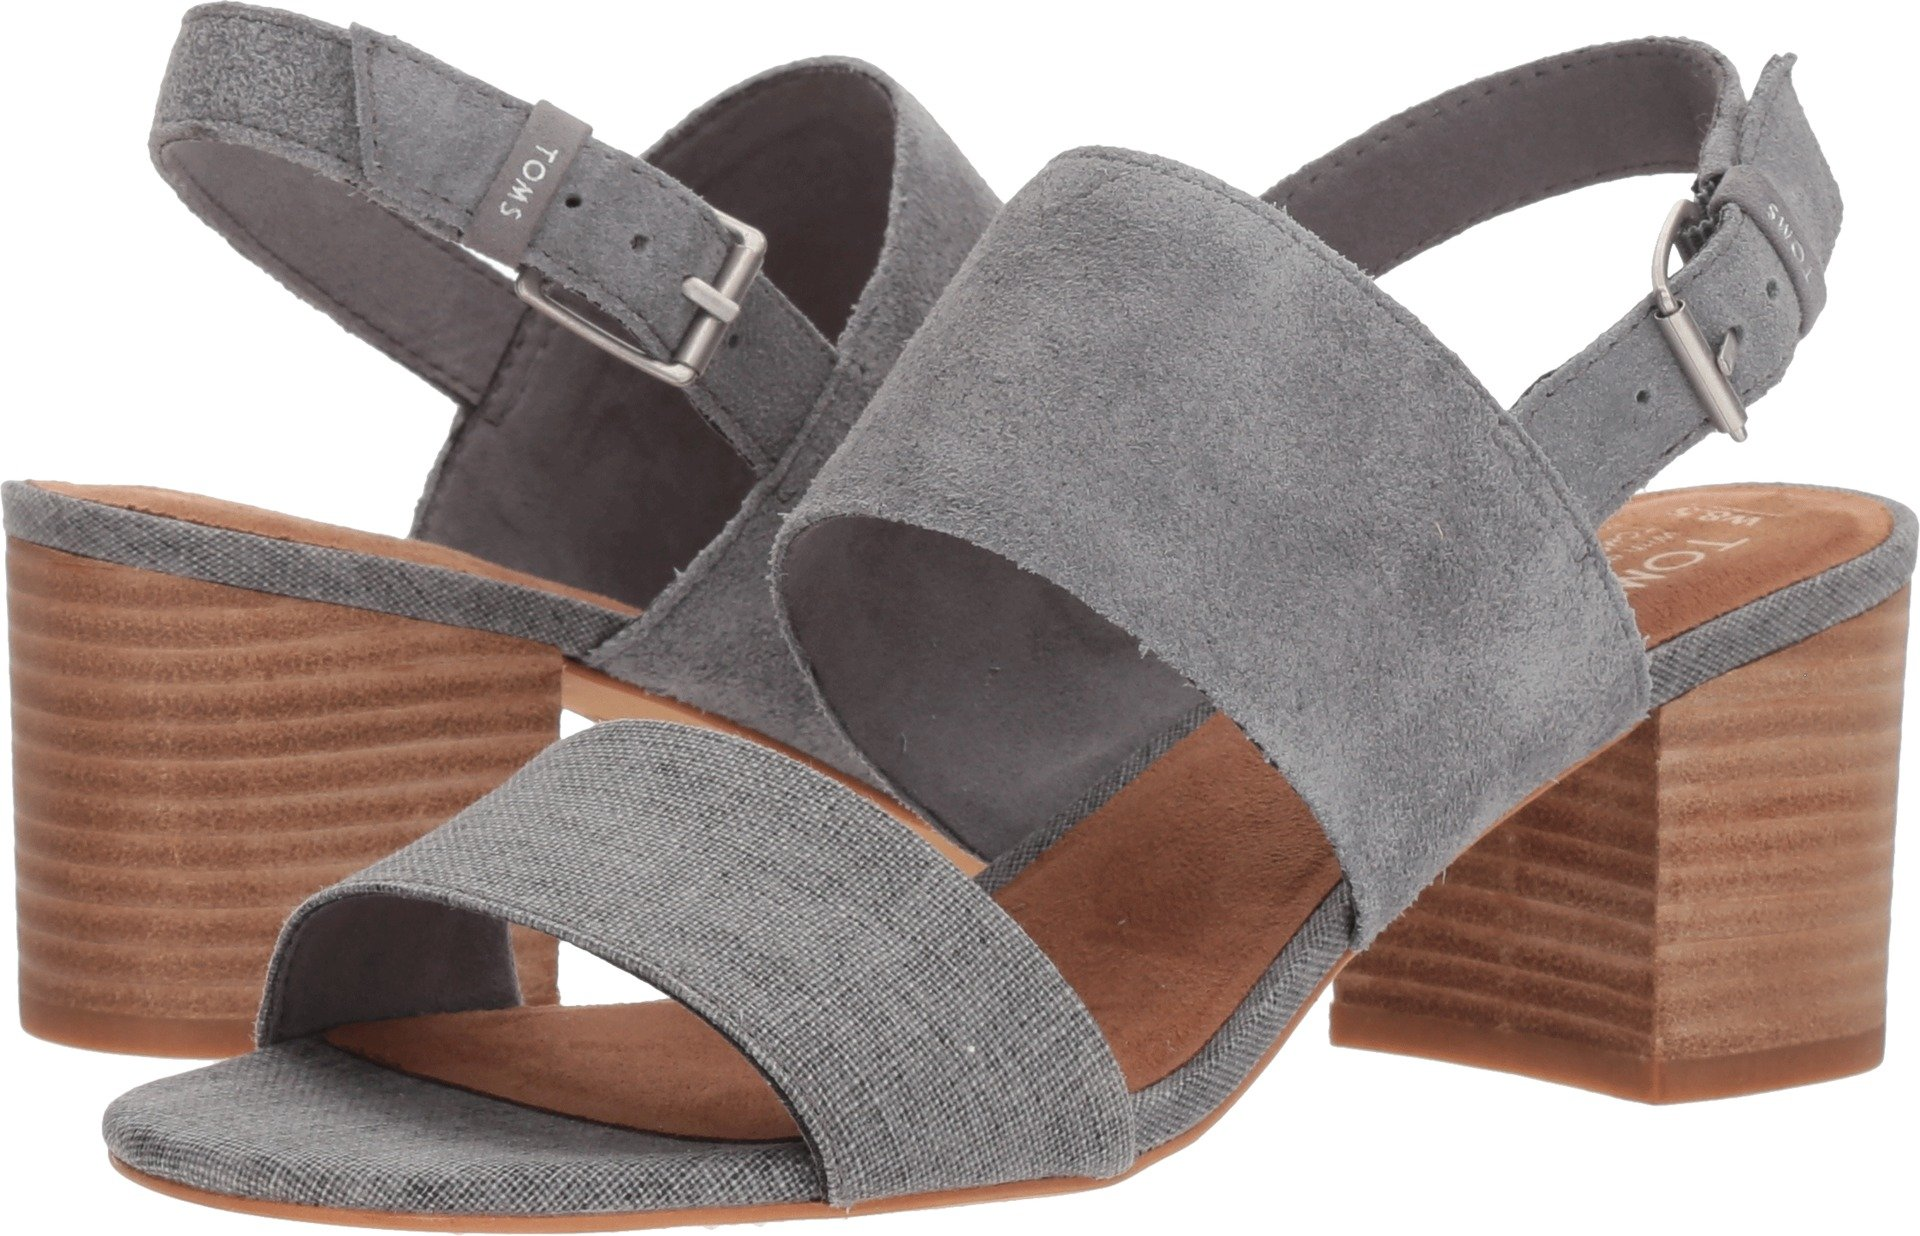 TOMS Women's Poppy Suede Sandal, Size: 11 B(M) US, Color: Shade Suede/Linen